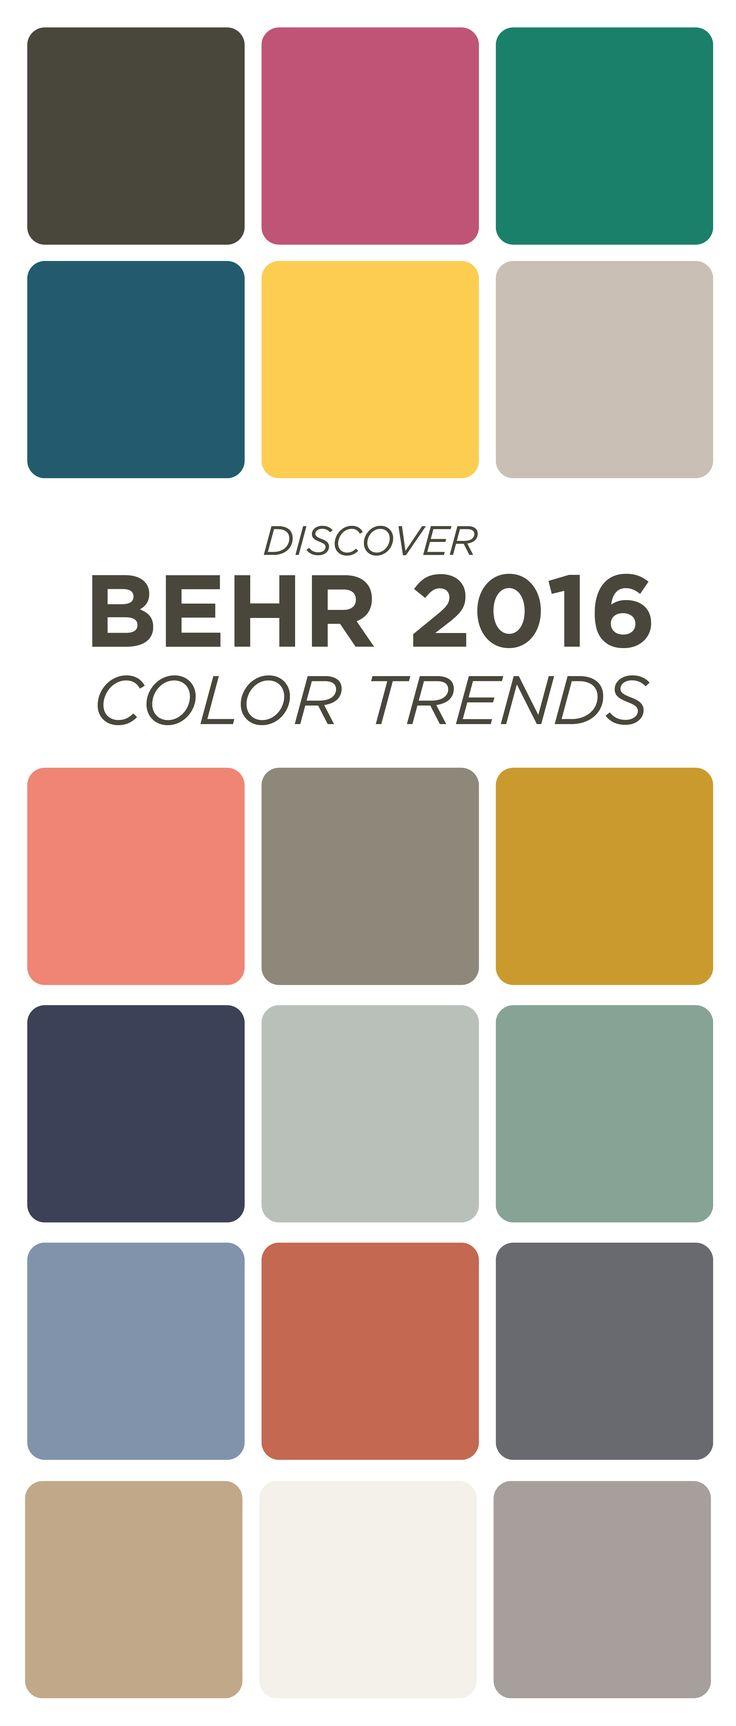 Paint Combinations 104 best behr 2016 color trends images on pinterest | color trends